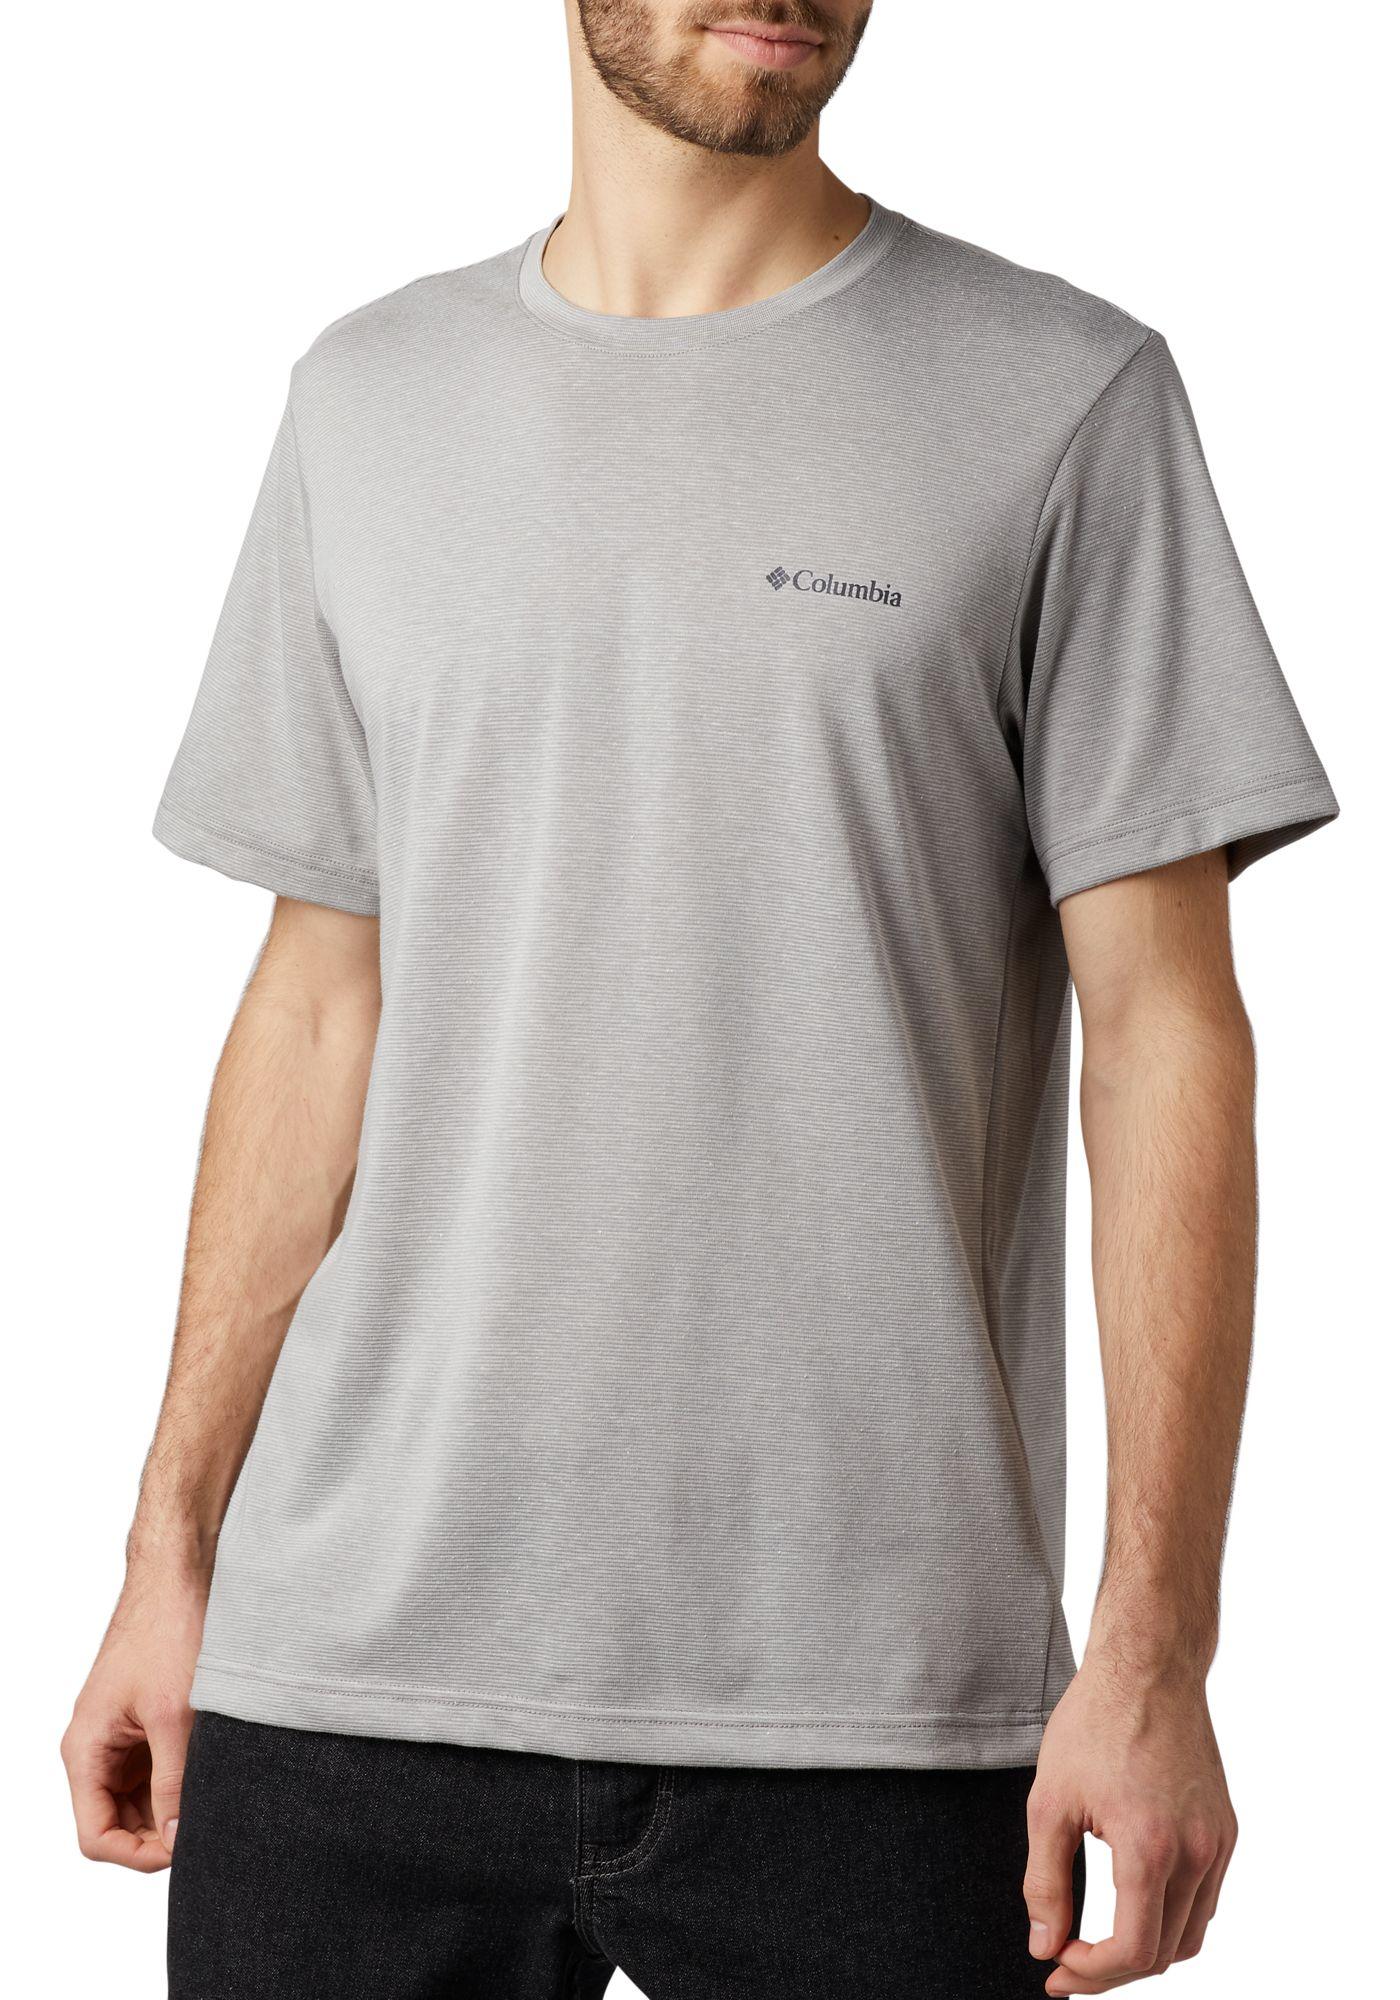 Columbia Men's Thistletown Ridge Crew T-Shirt